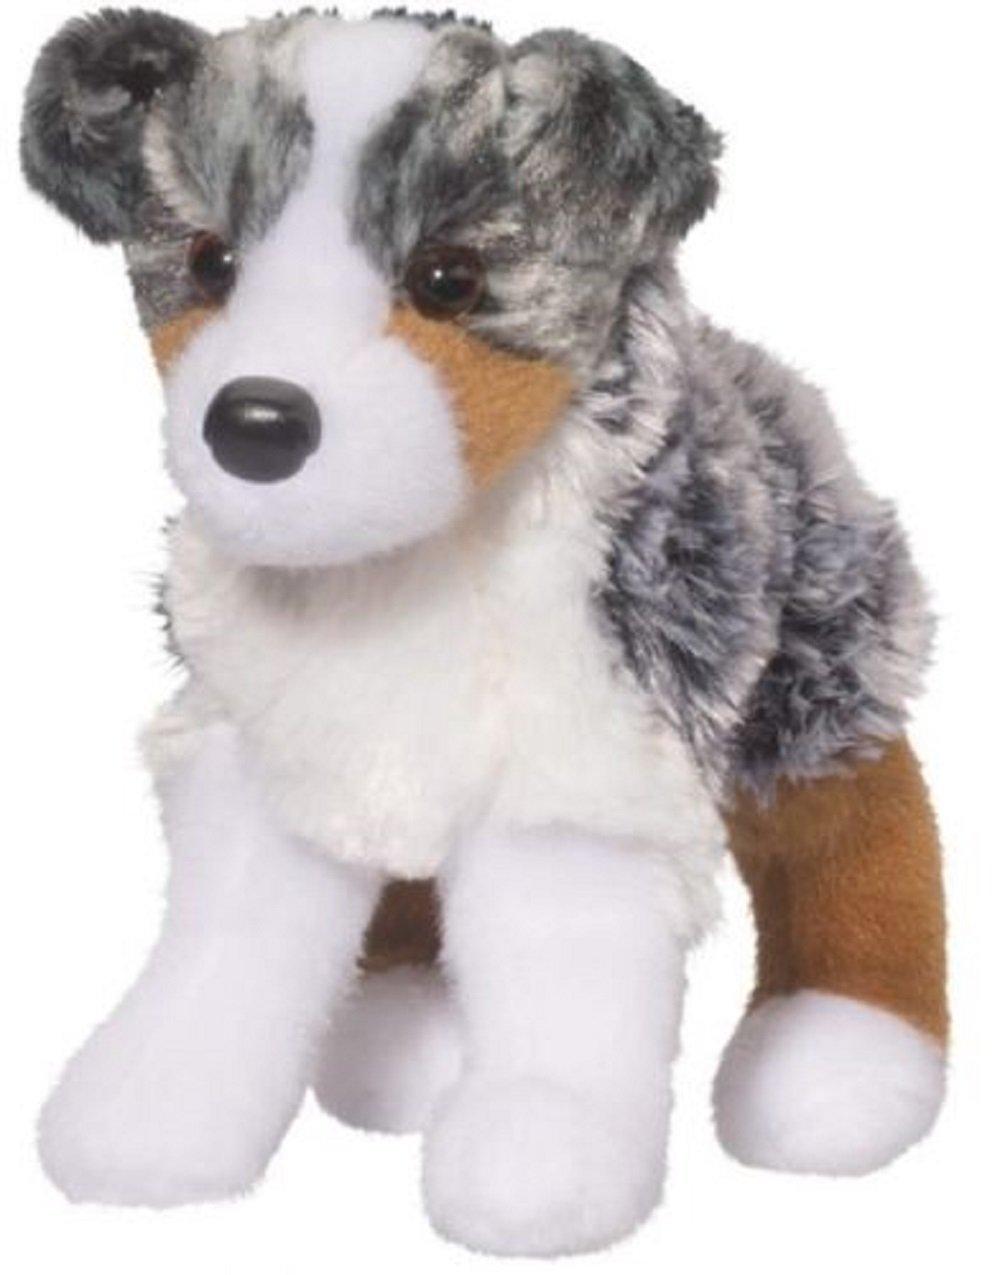 Douglas Cuddle Toys Steward Australian Shepherd Dog #4019 Stuffed Animal Toy